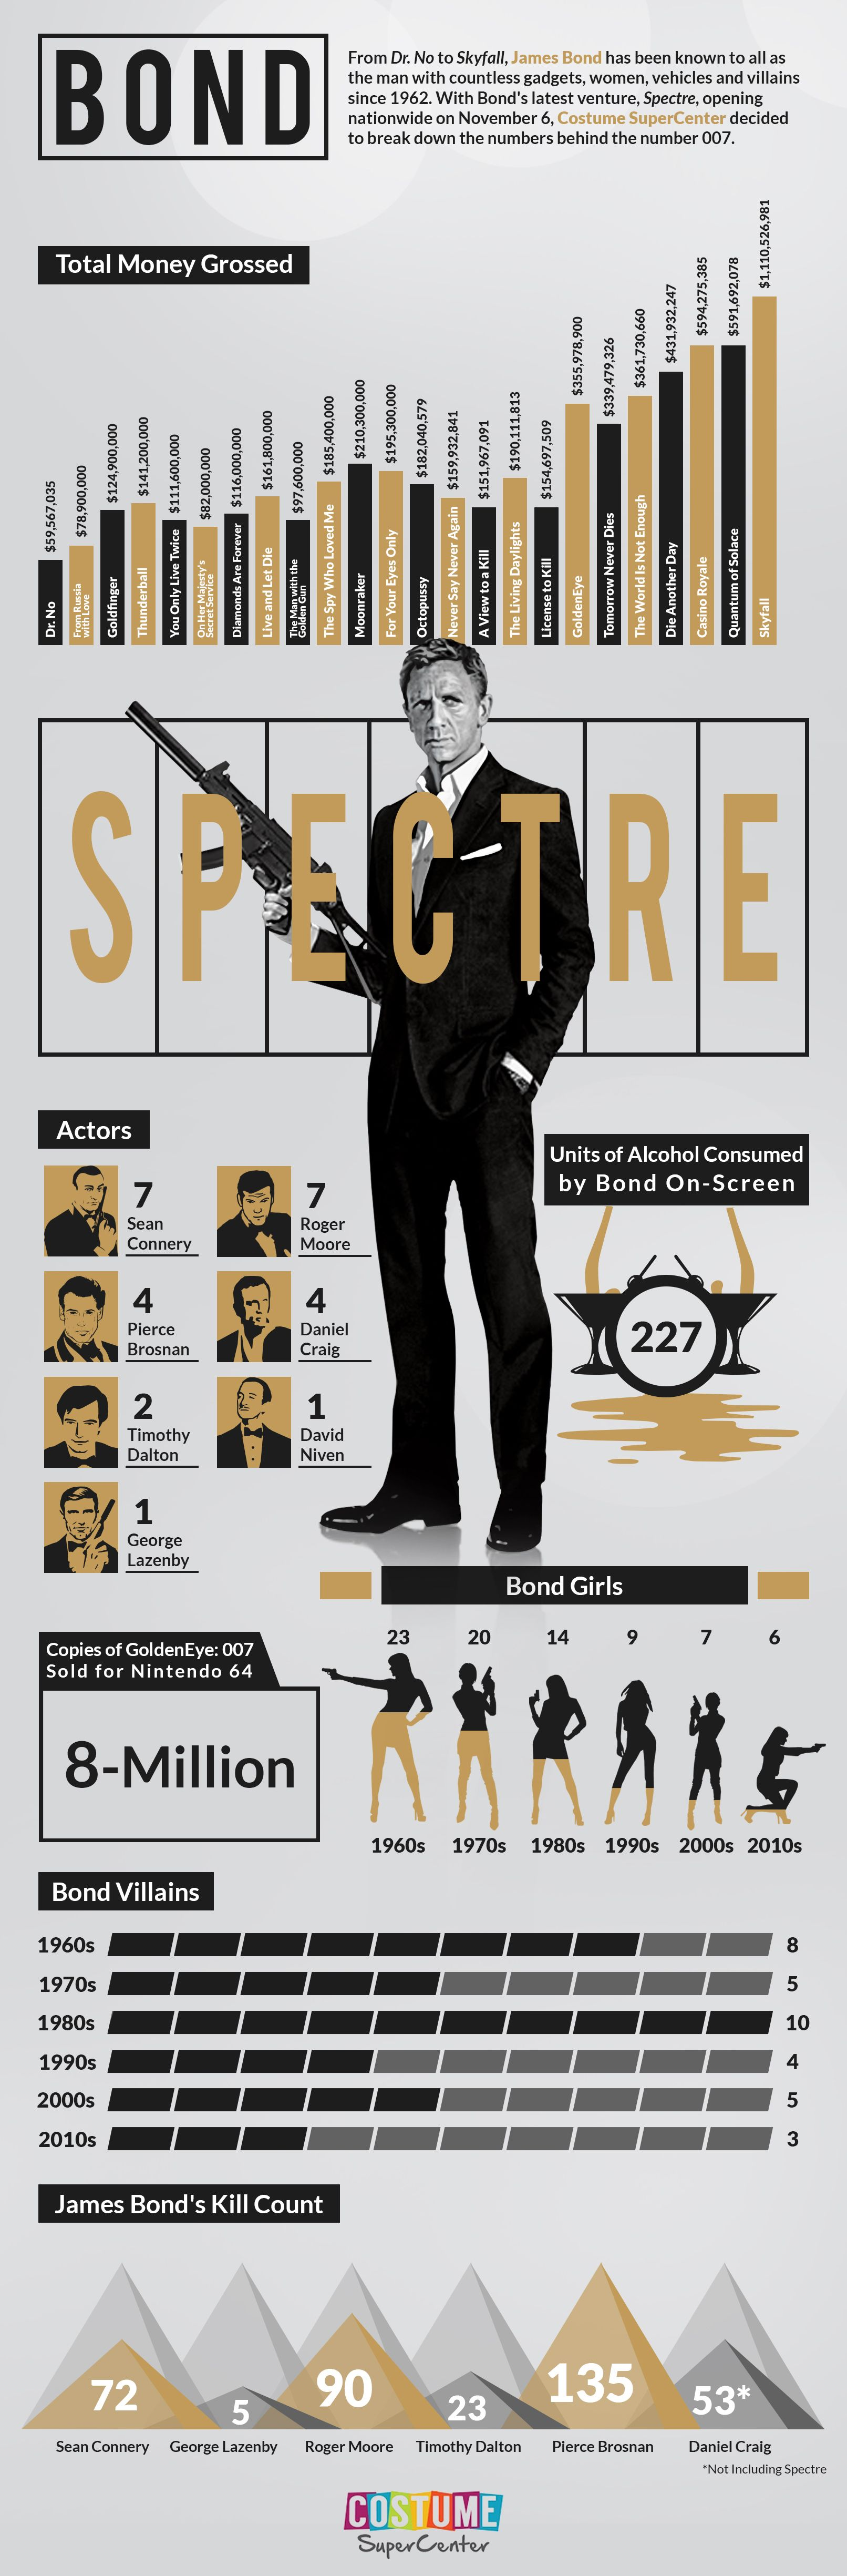 007 James Bond Daniel Craig Spectre Shooting Movie Poster Fabric Decor 116